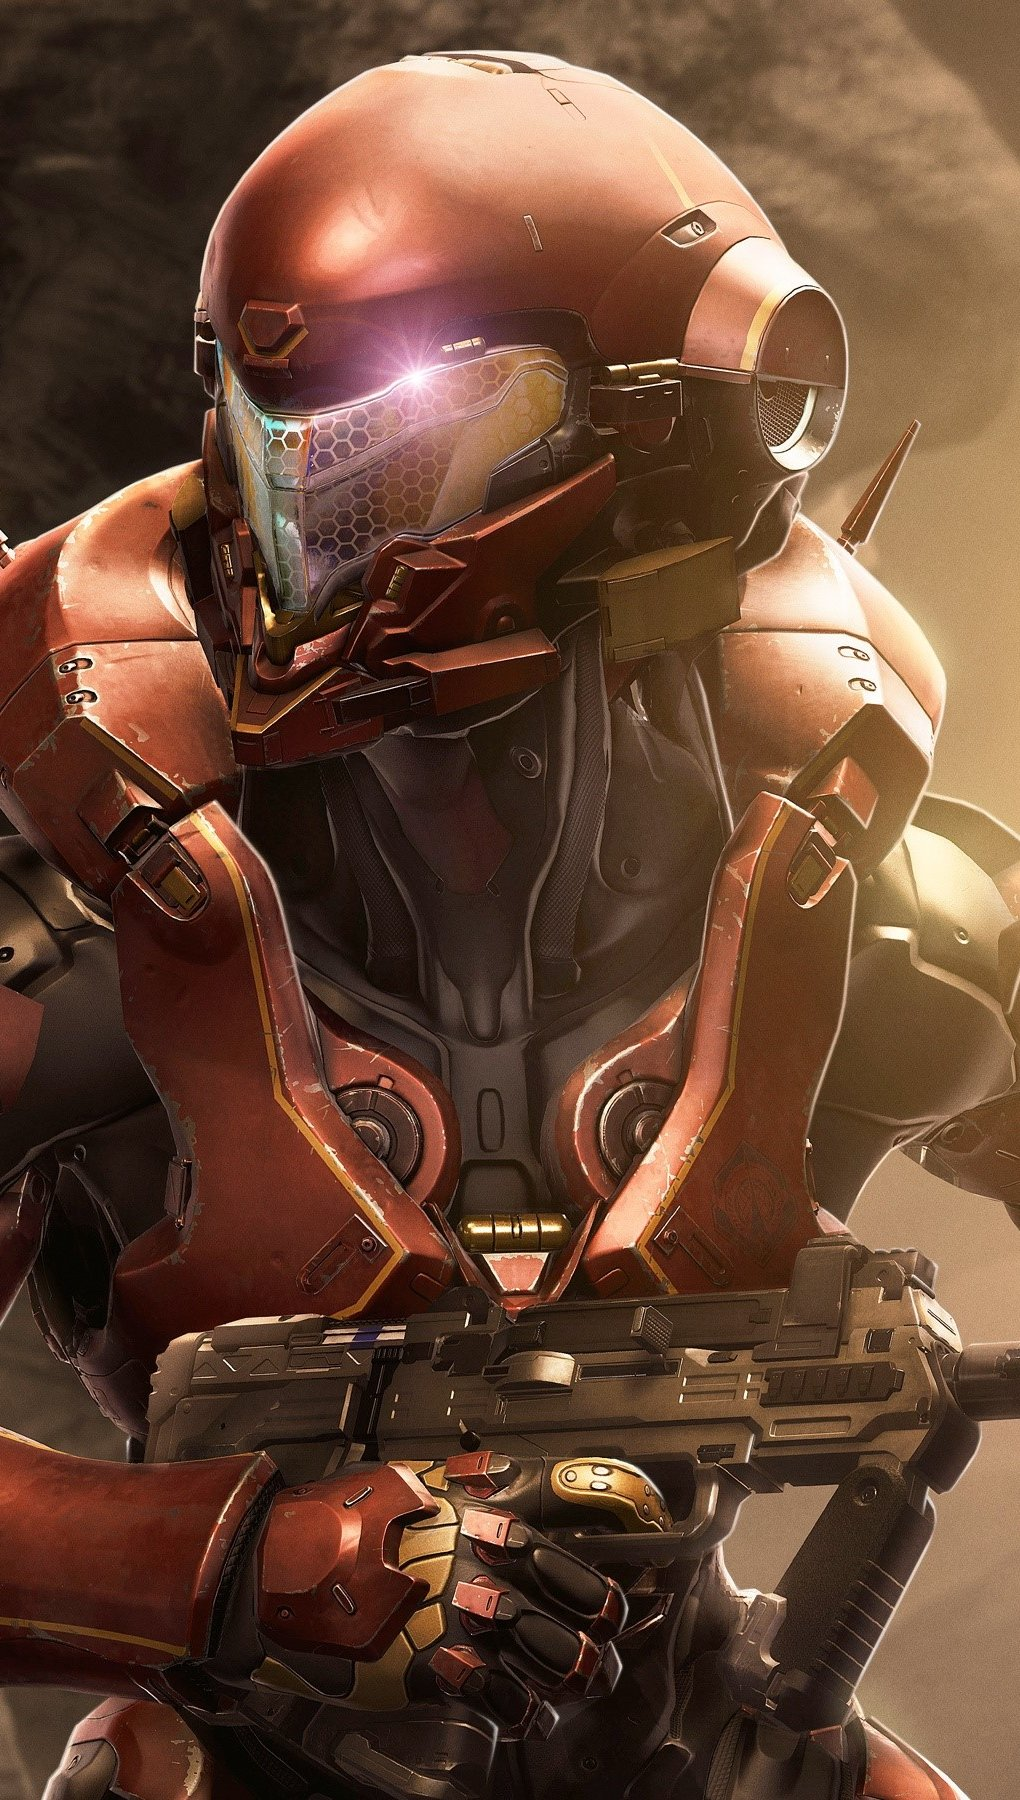 Wallpaper It's worth it in Halo 5 Guardians Vertical